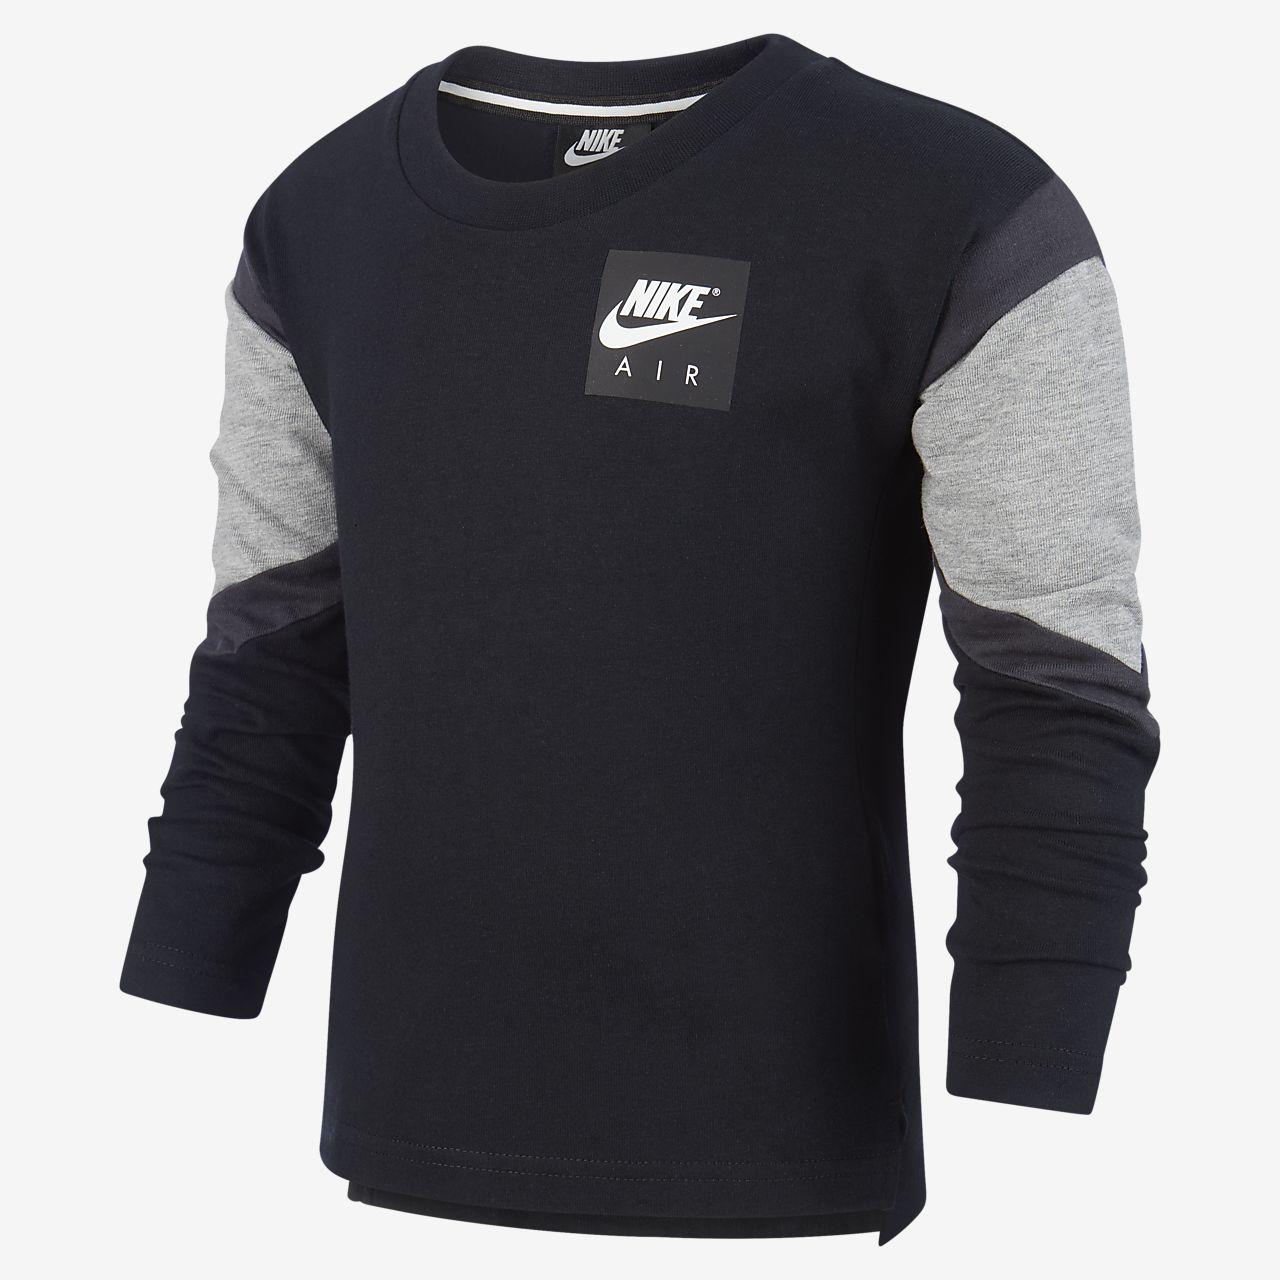 c4f557dcc Nike Air Toddler Camiseta de manga larga - Infantil. Nike.com ES